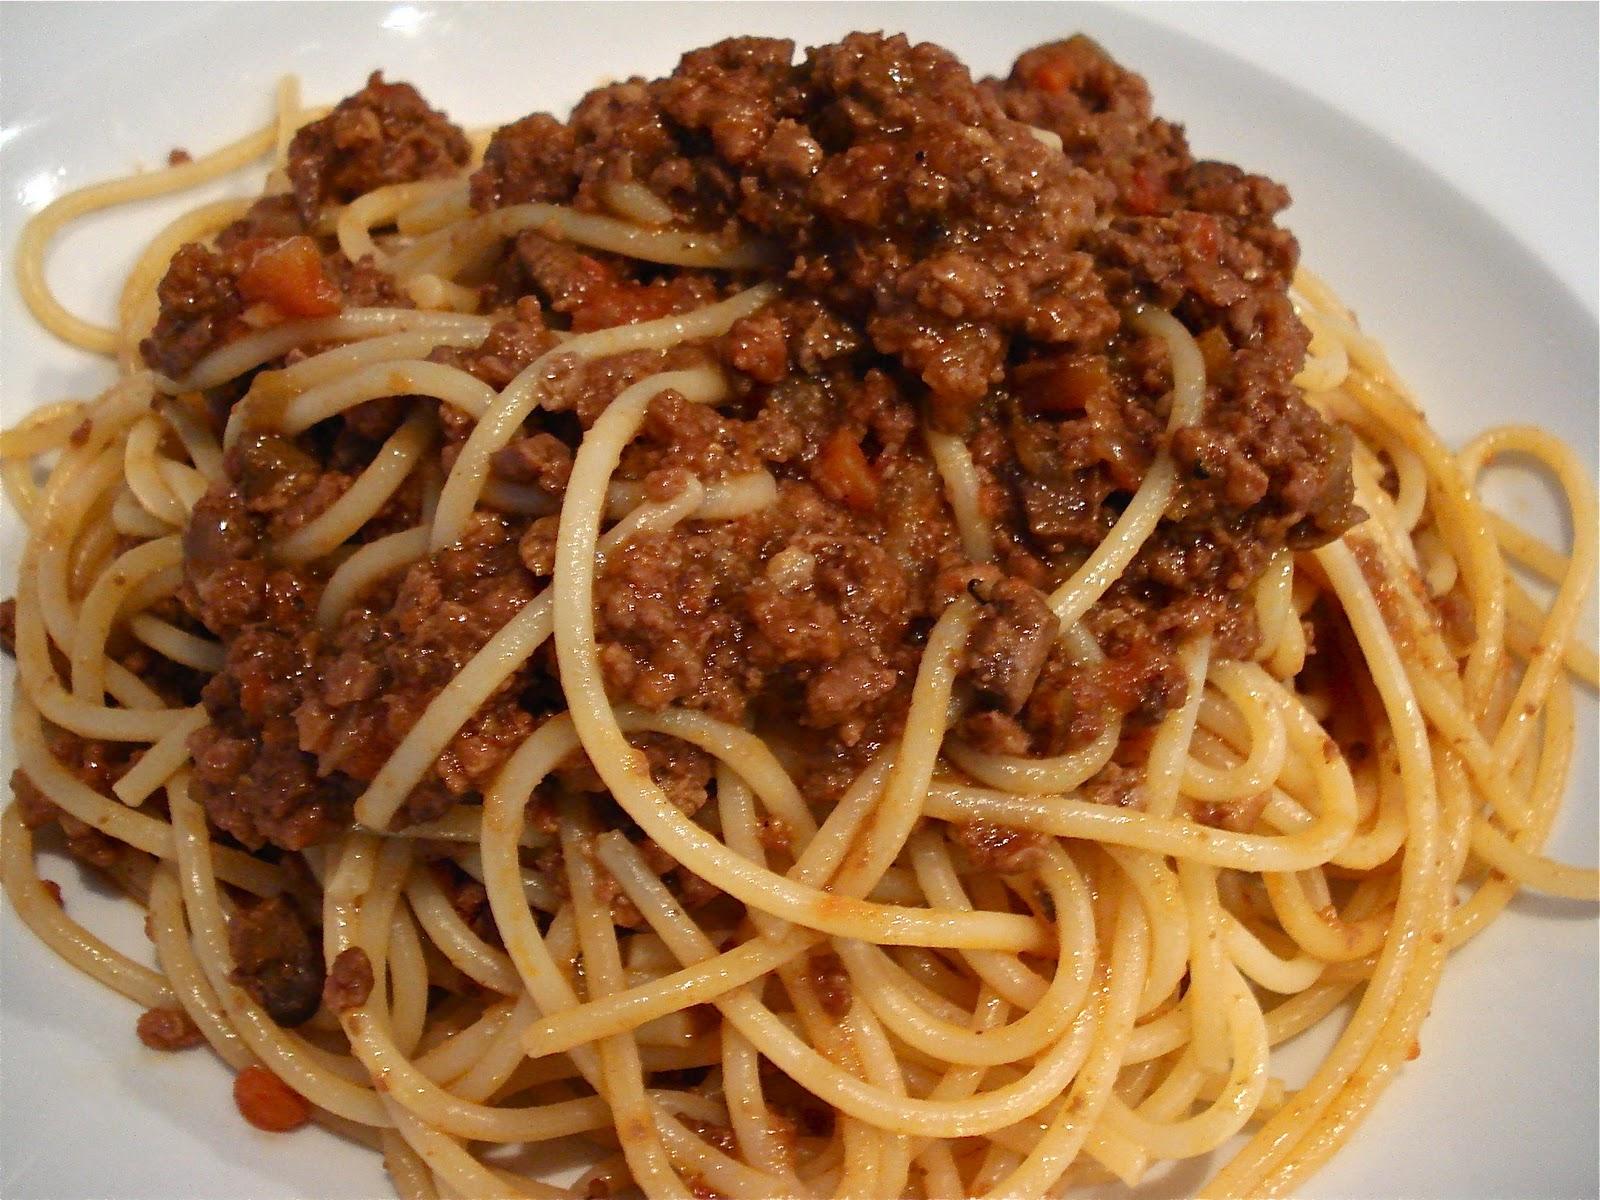 http://bolognain.info/wp-content/uploads/2015/10/Spaghetti.jpg